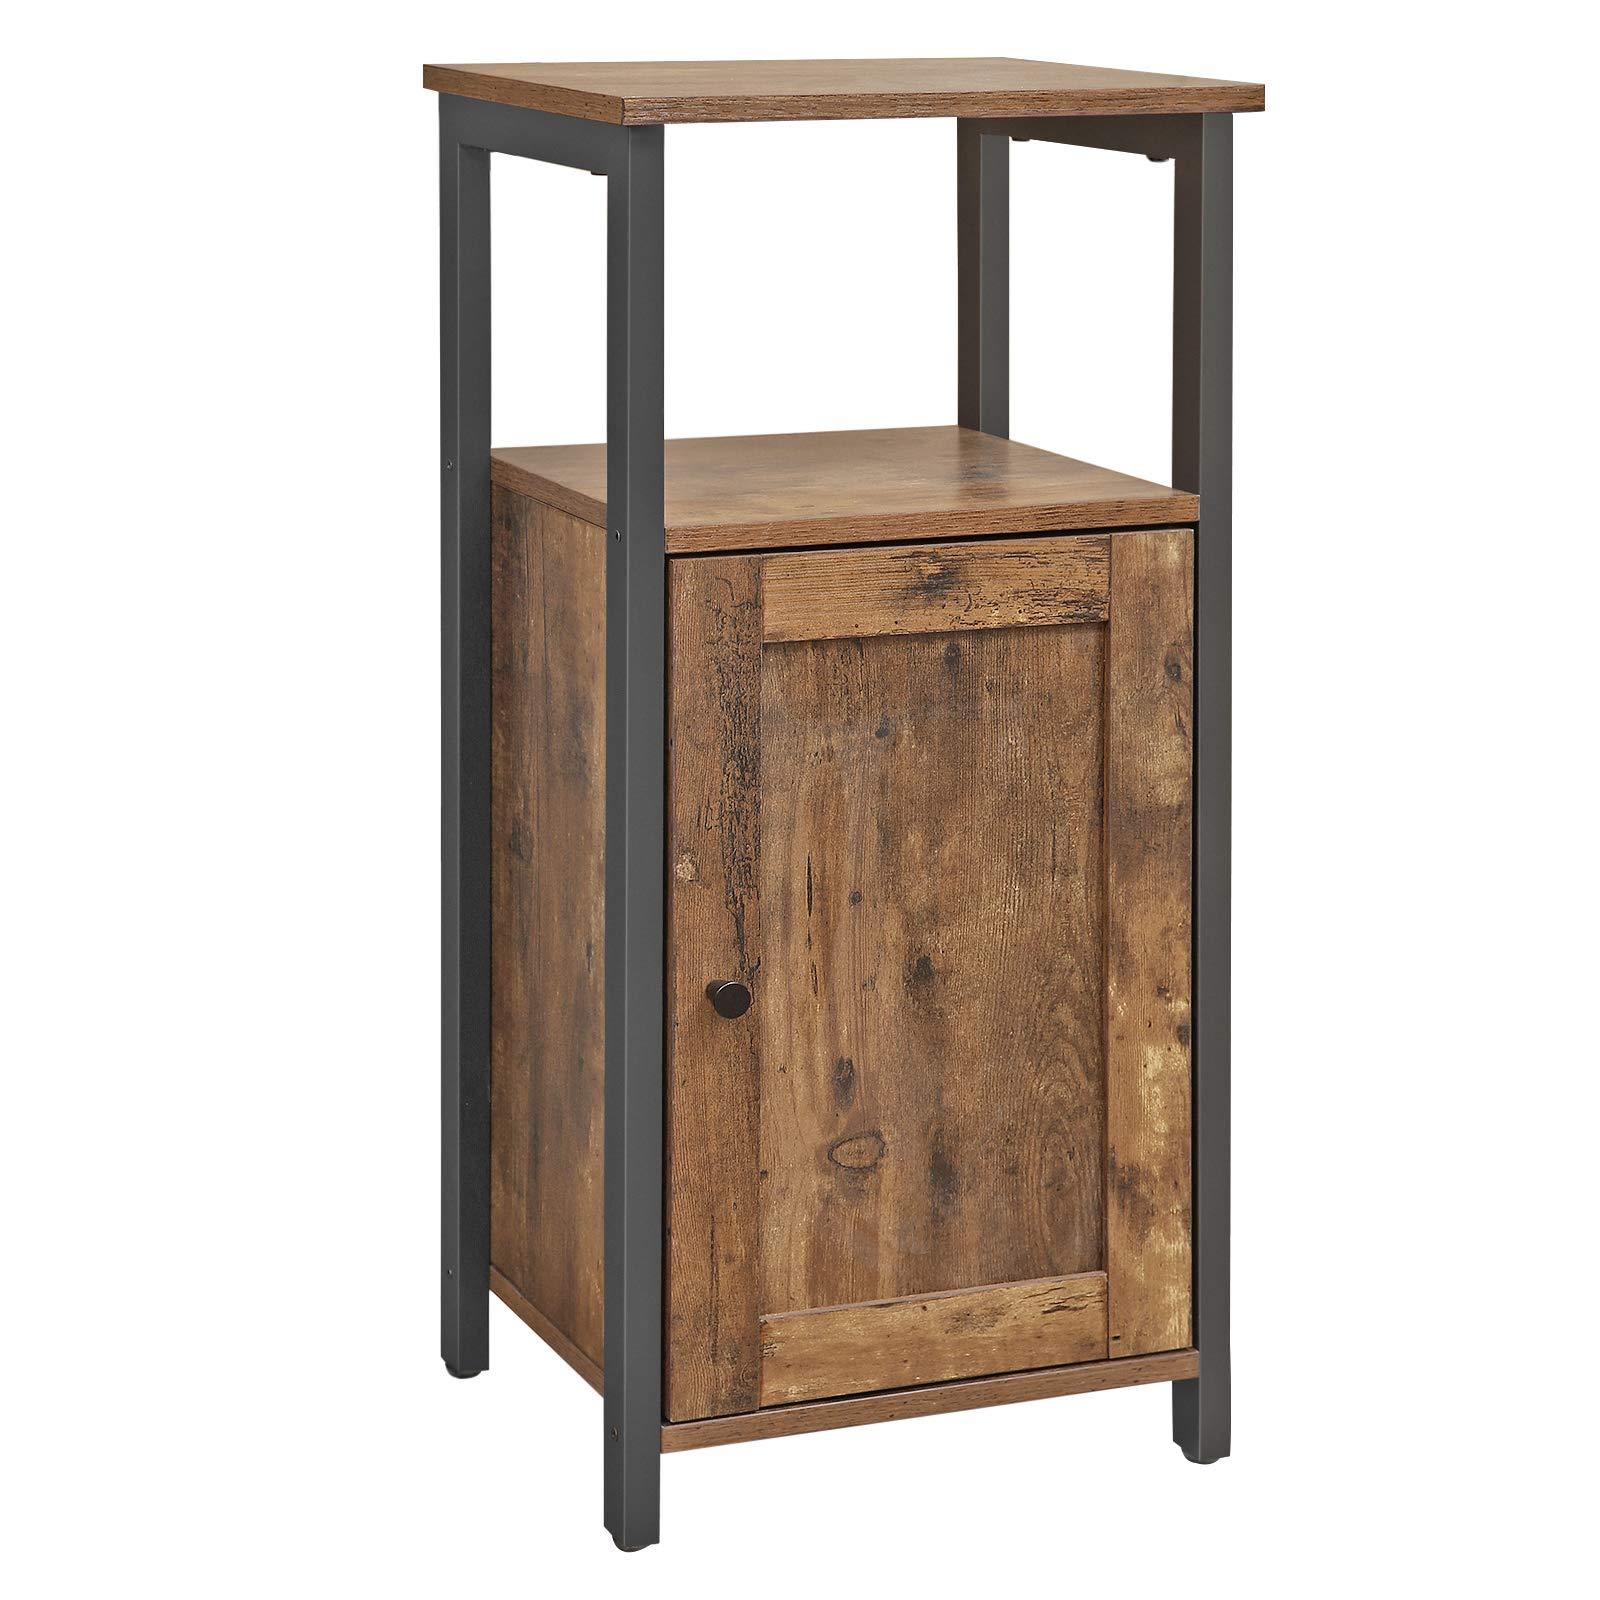 VASAGLE Floor Standing Cabinet, Industrial Kitchen Storage Cabinet with Cupboard, Multifunctional Shelving for Living Room, Bedroom, Bathroom, Study, Rustic Brown LSC24BX